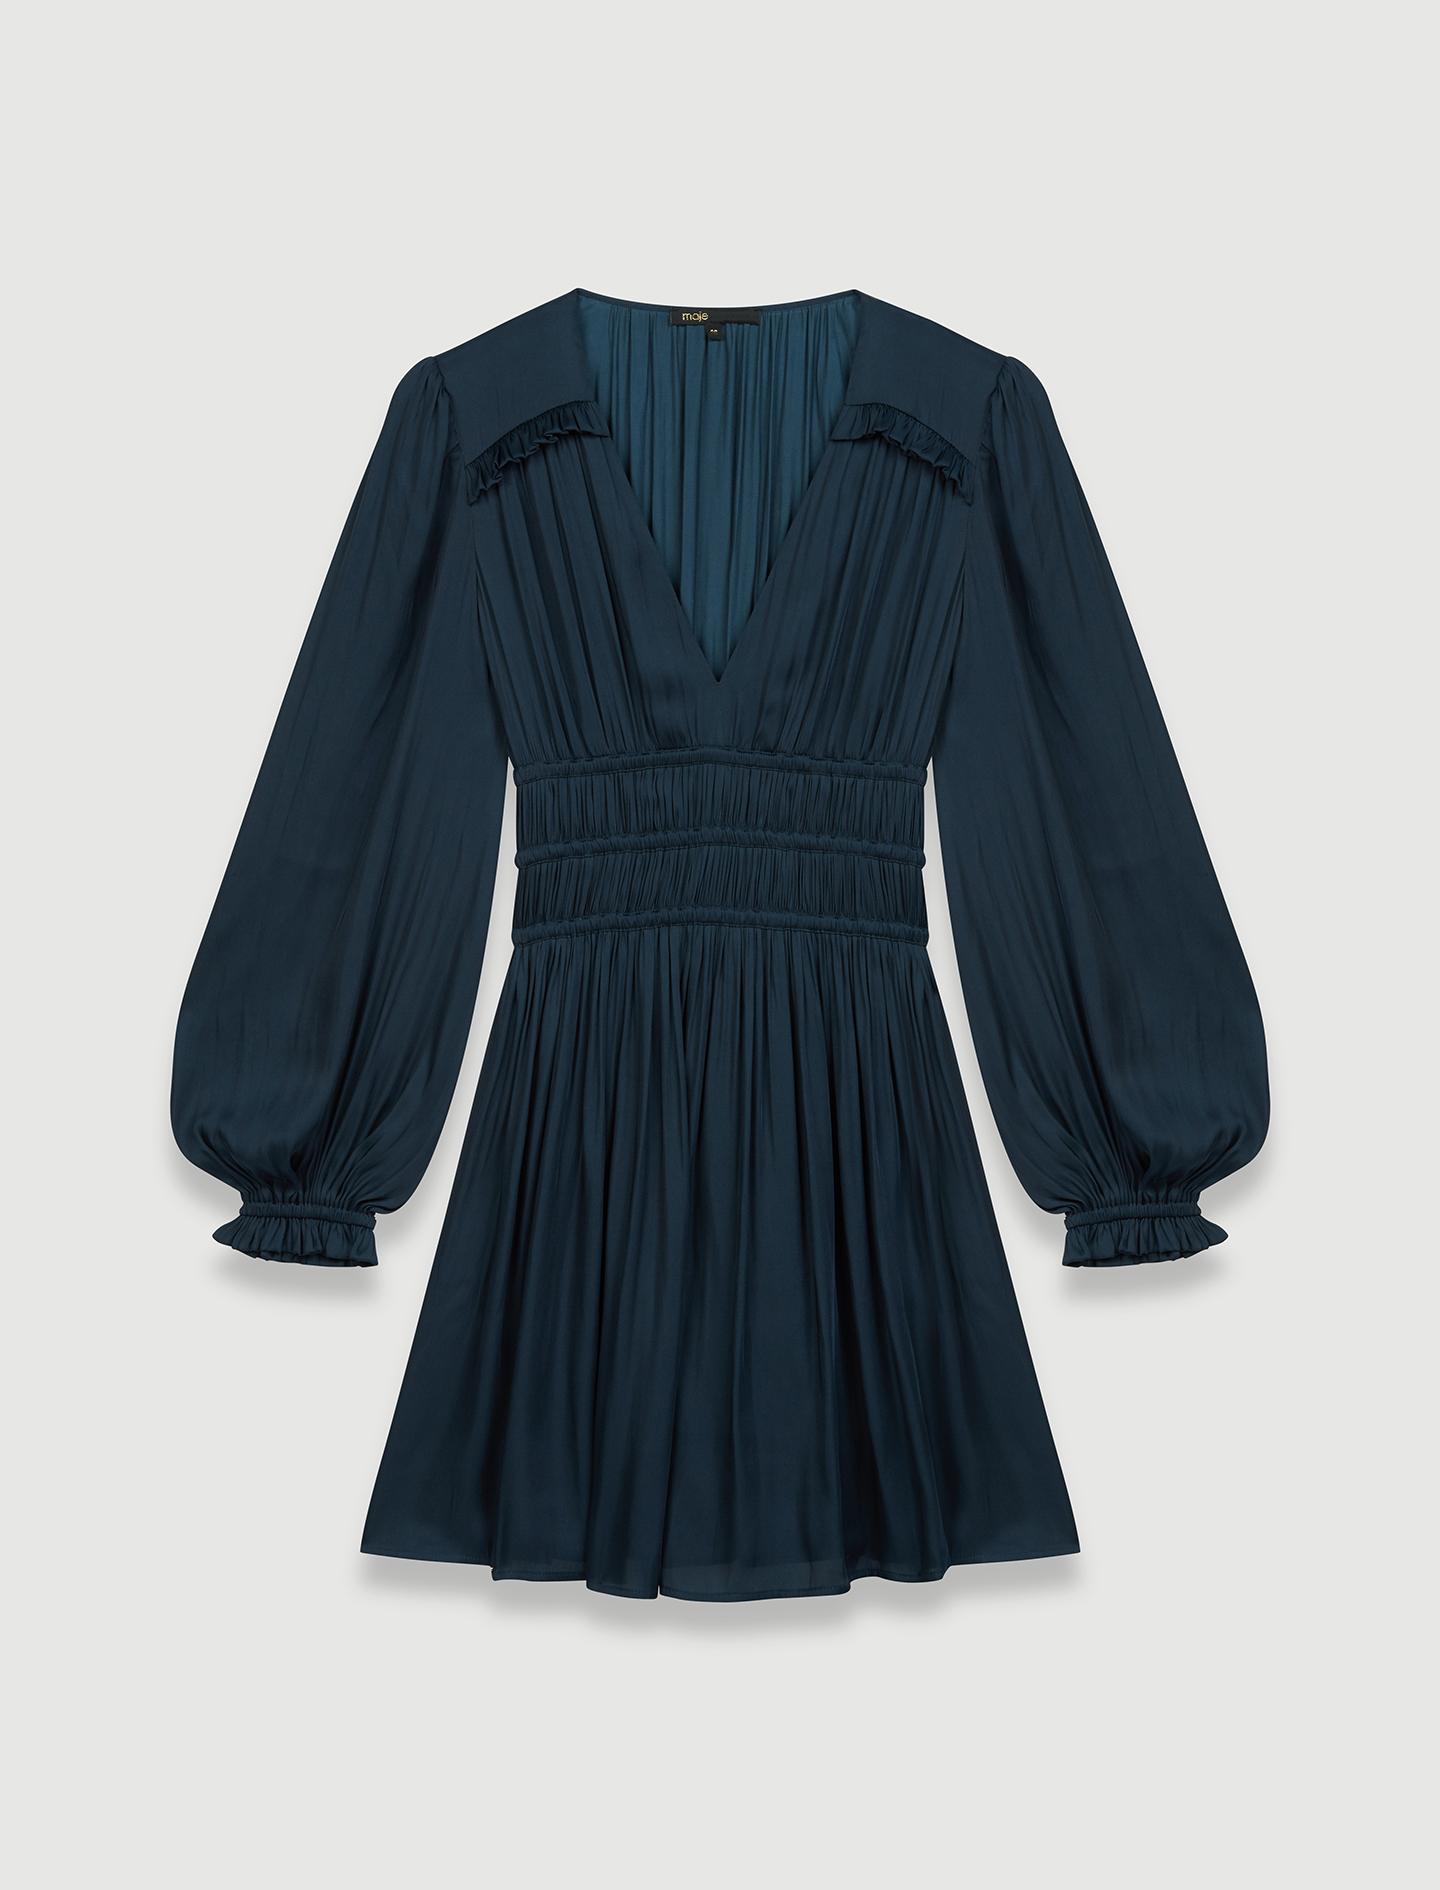 Satin dress with ruffles  - Navy